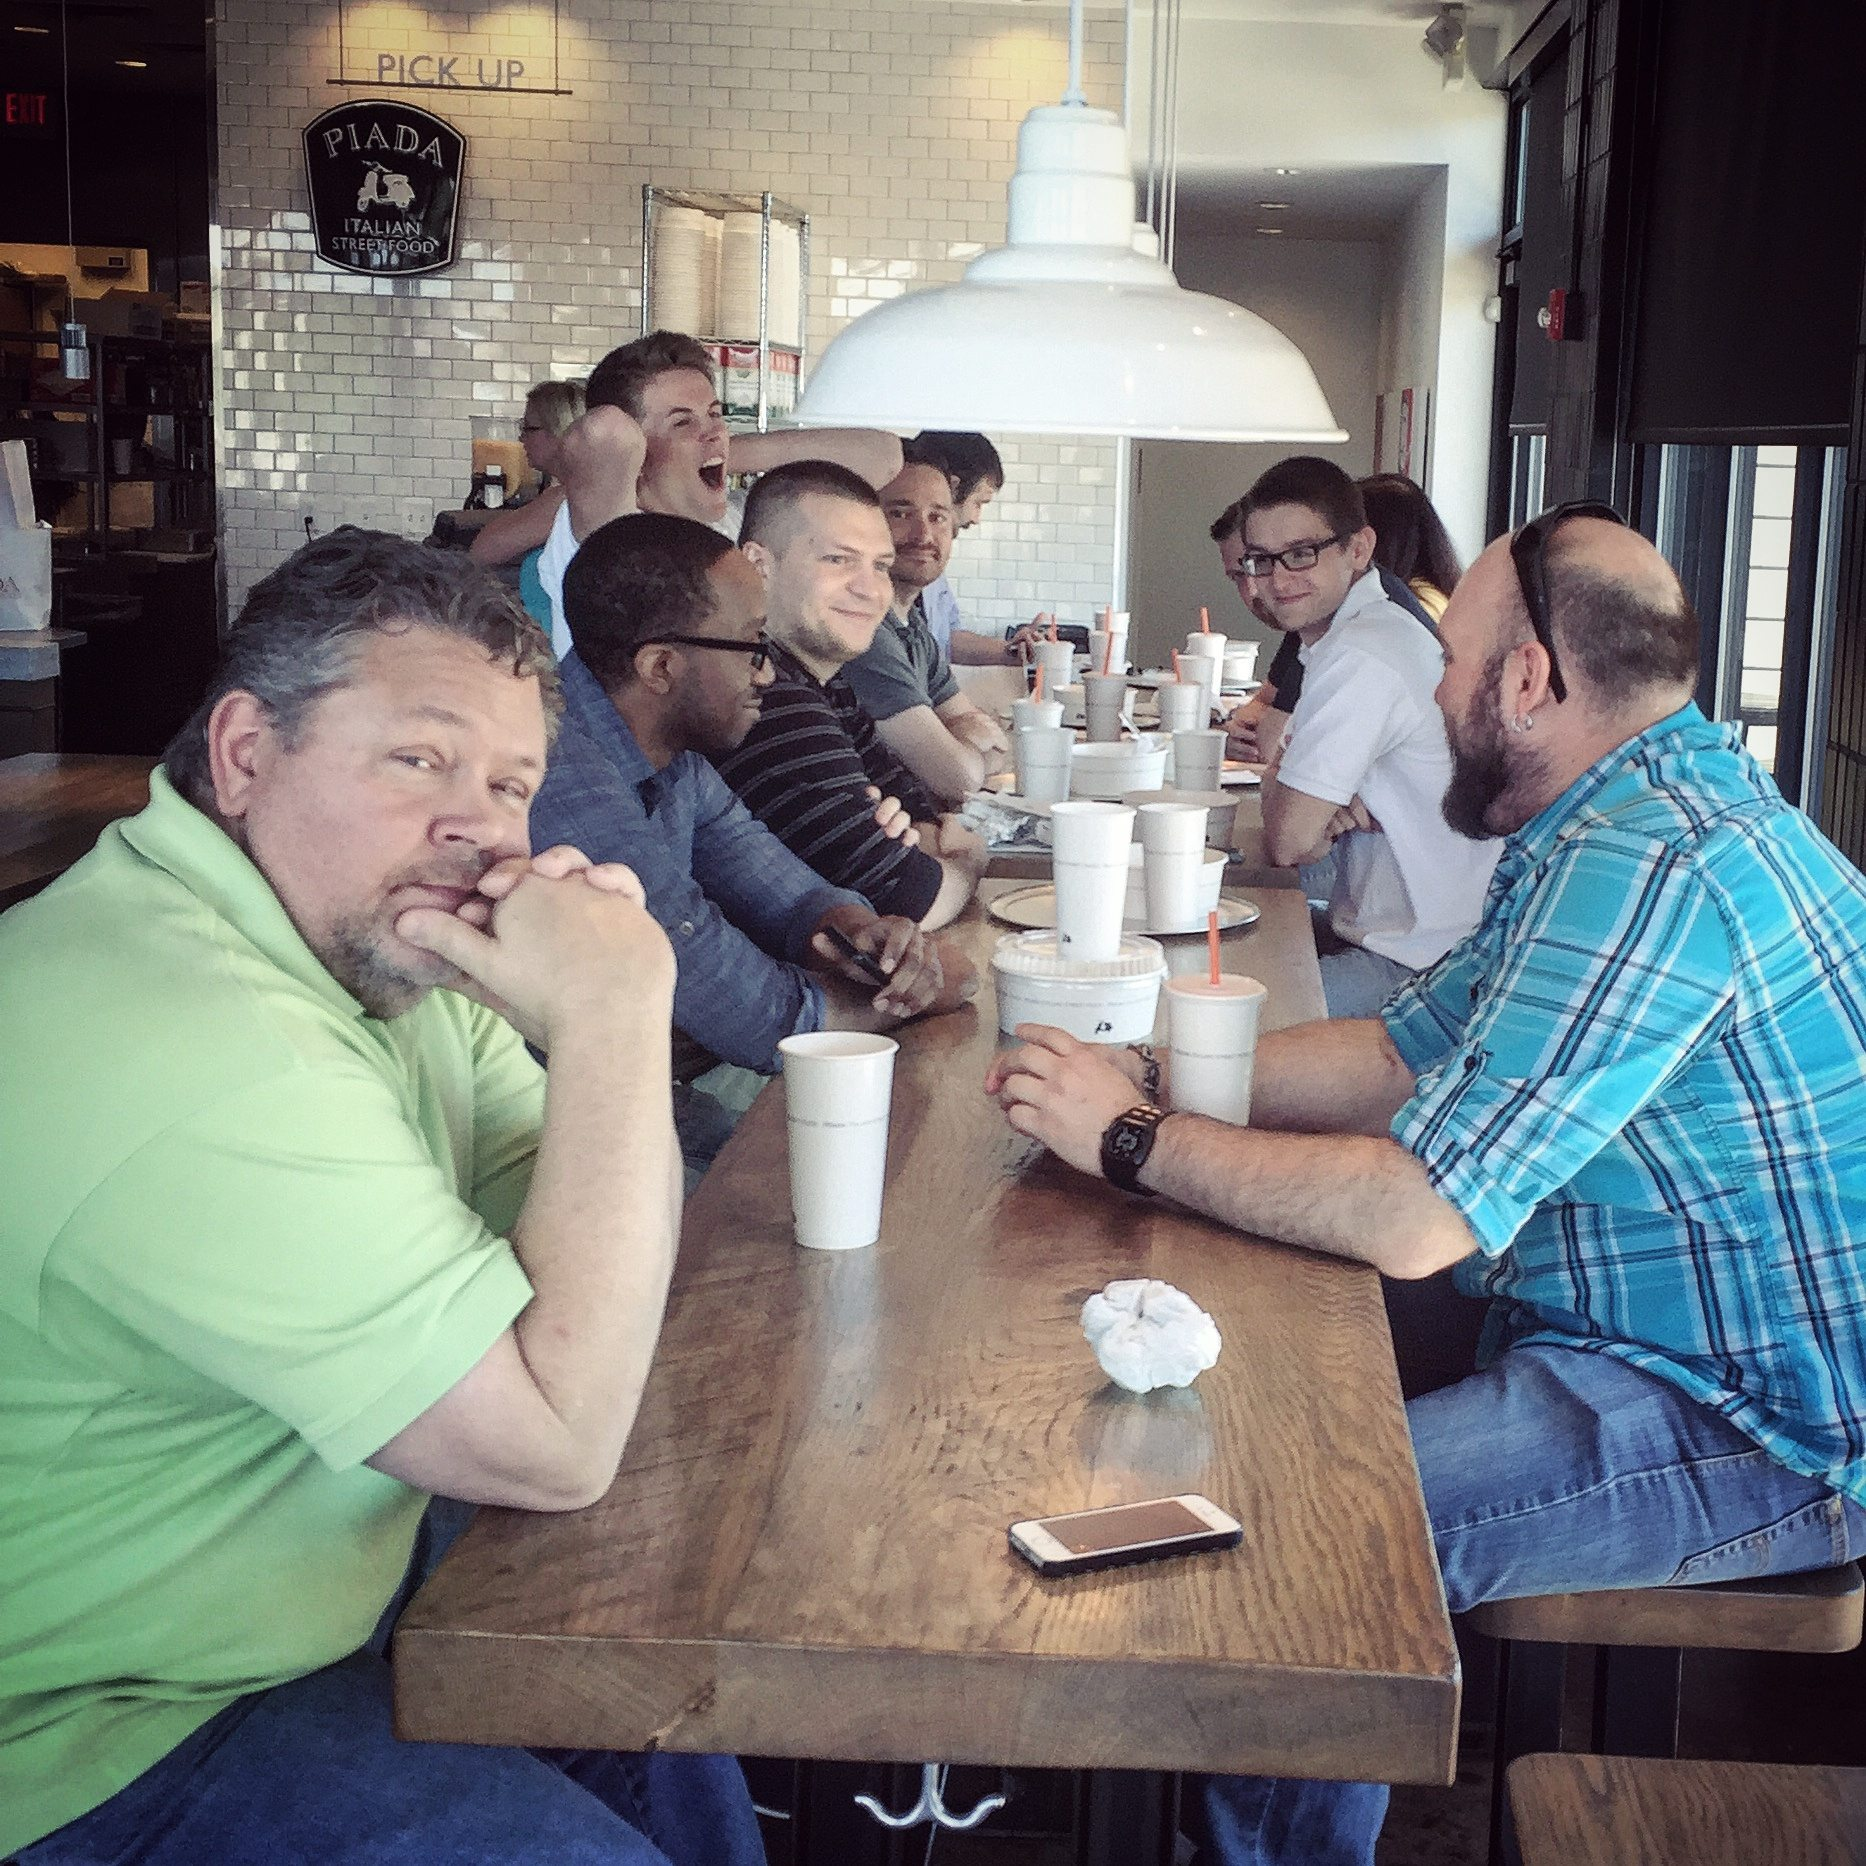 Chepri team enjoys lunch at Piada